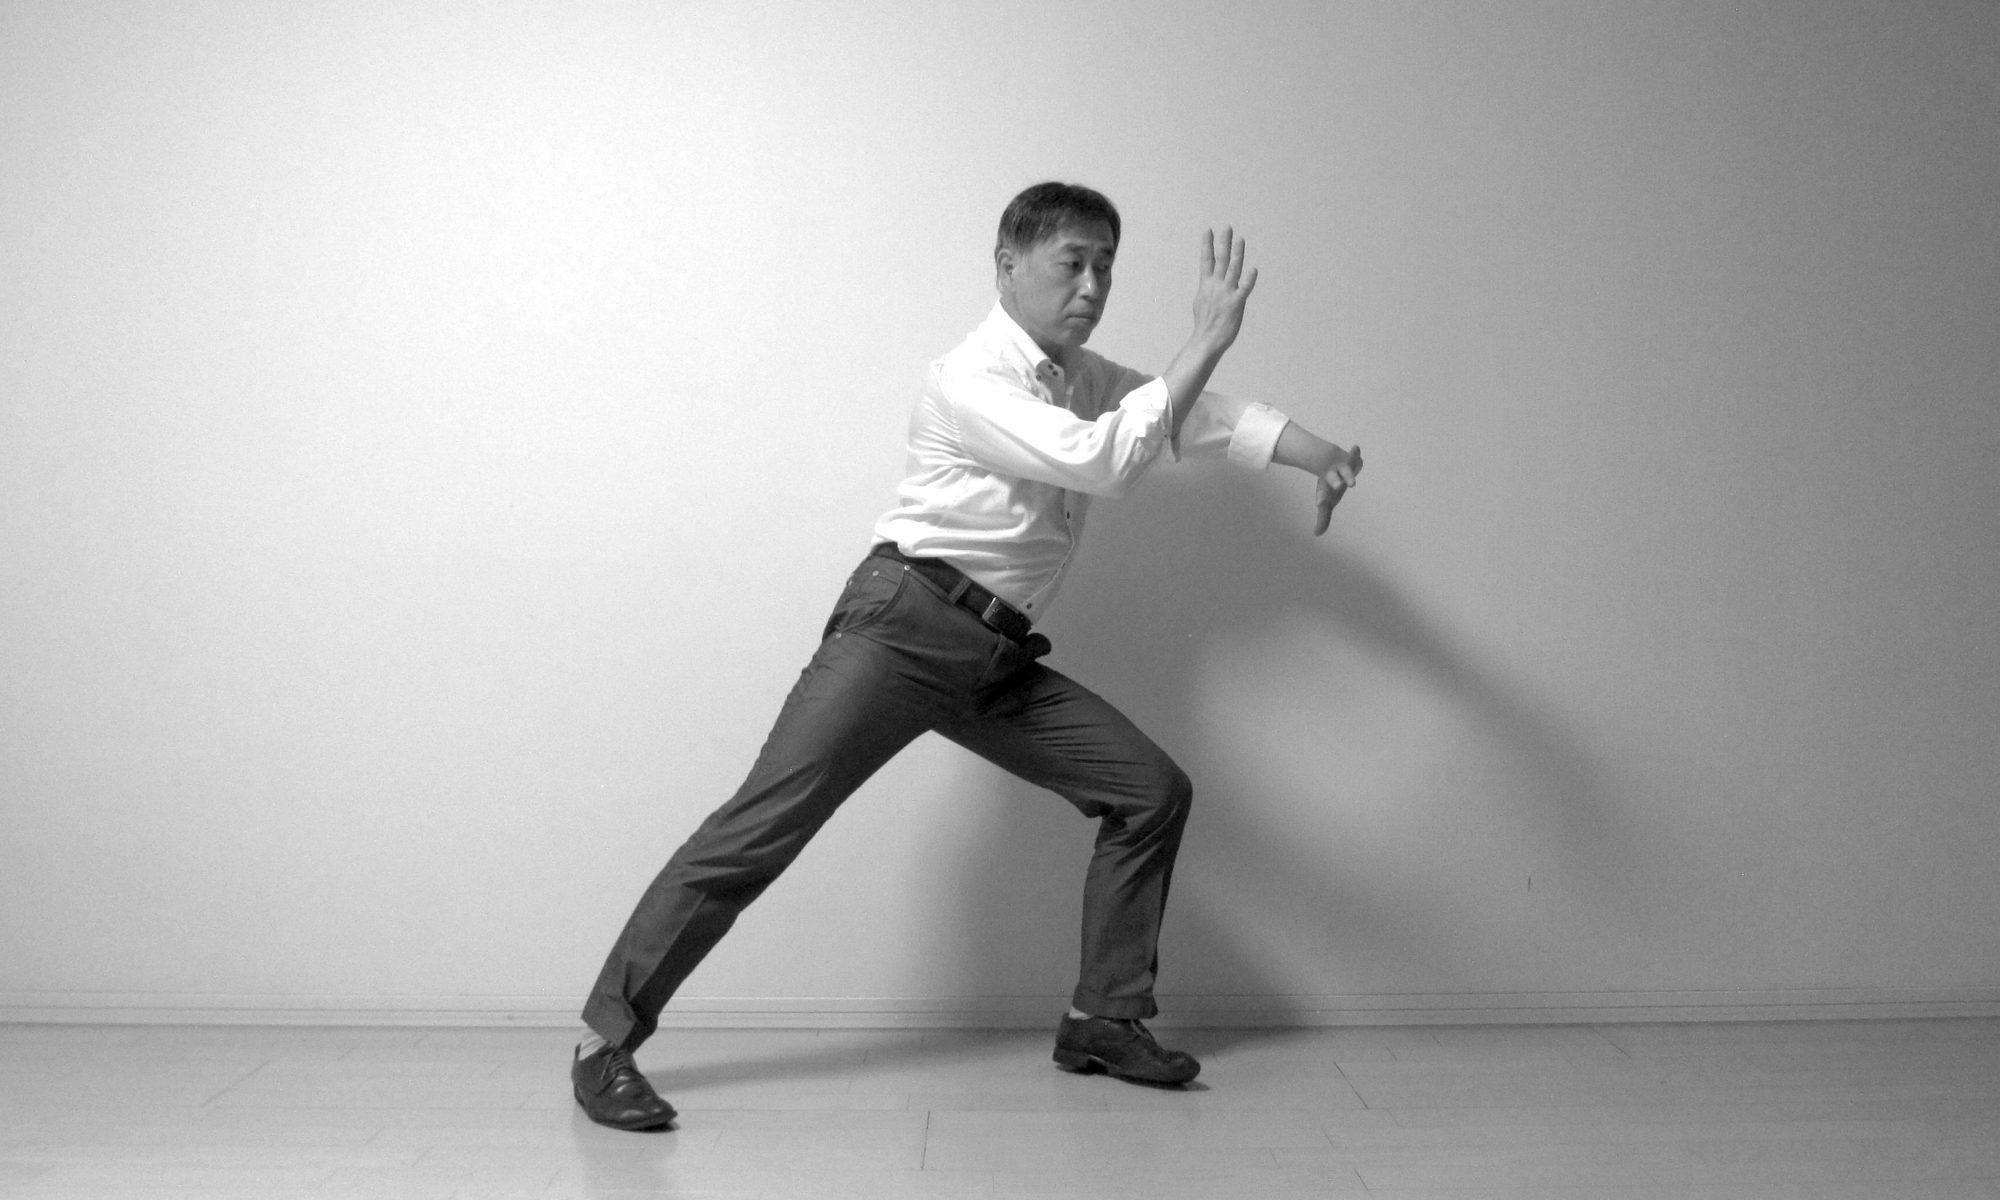 太極拳 搂膝拗步 Taijiquan